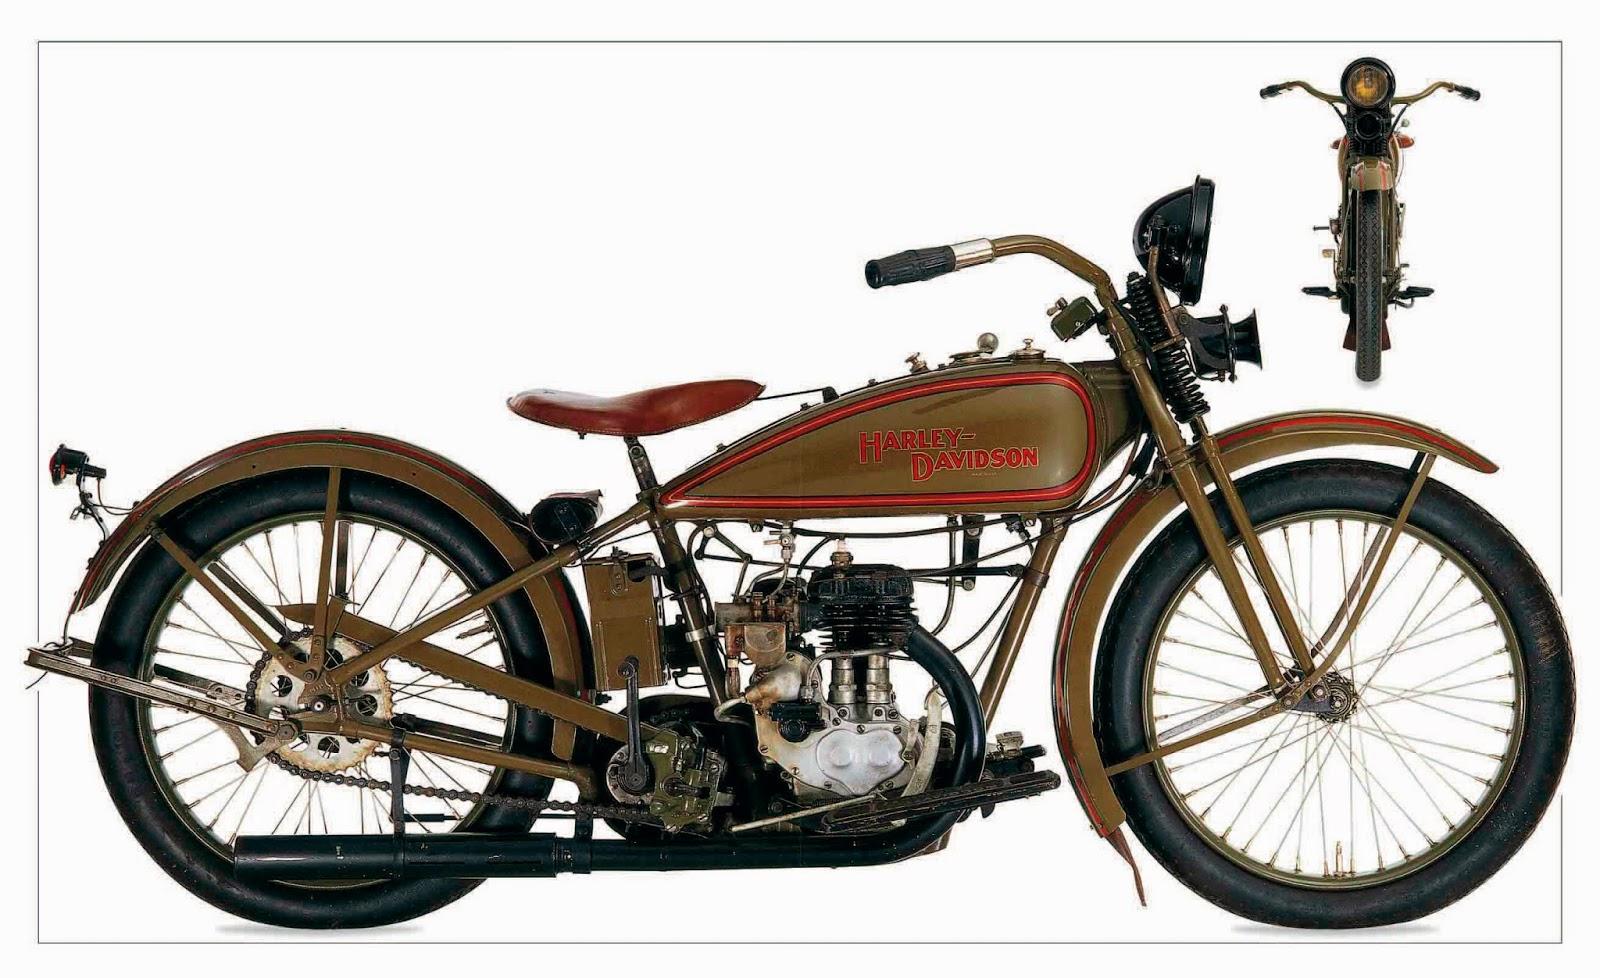 Harley Davidson 1926 Model B